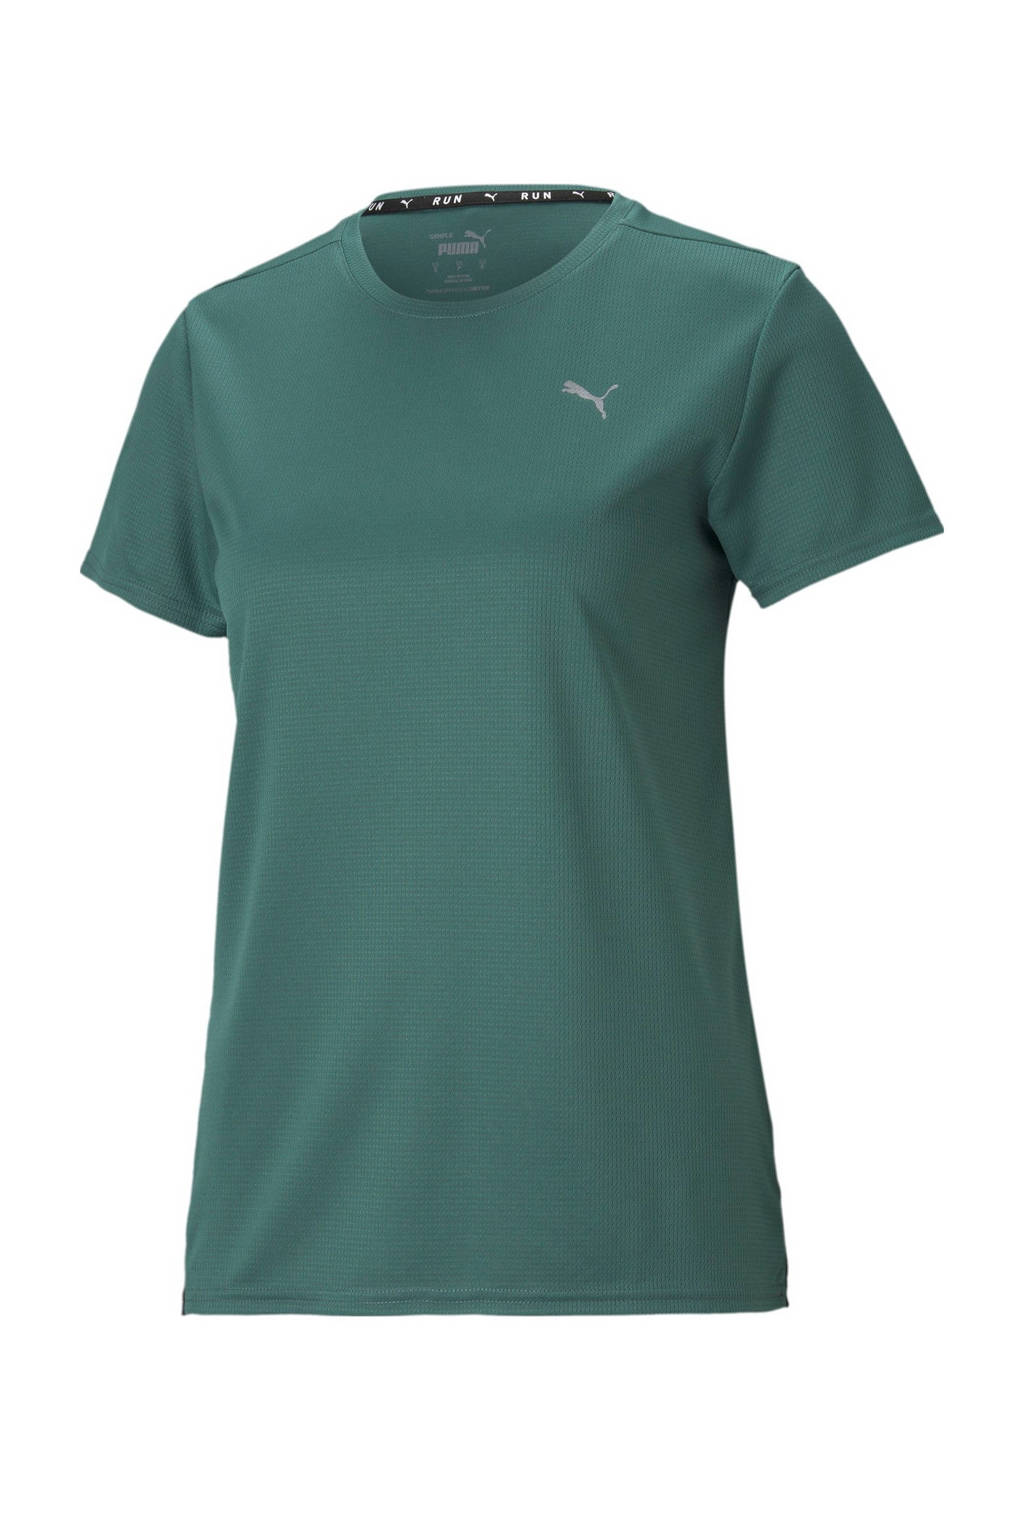 Puma hardloopshirt groen, Groen